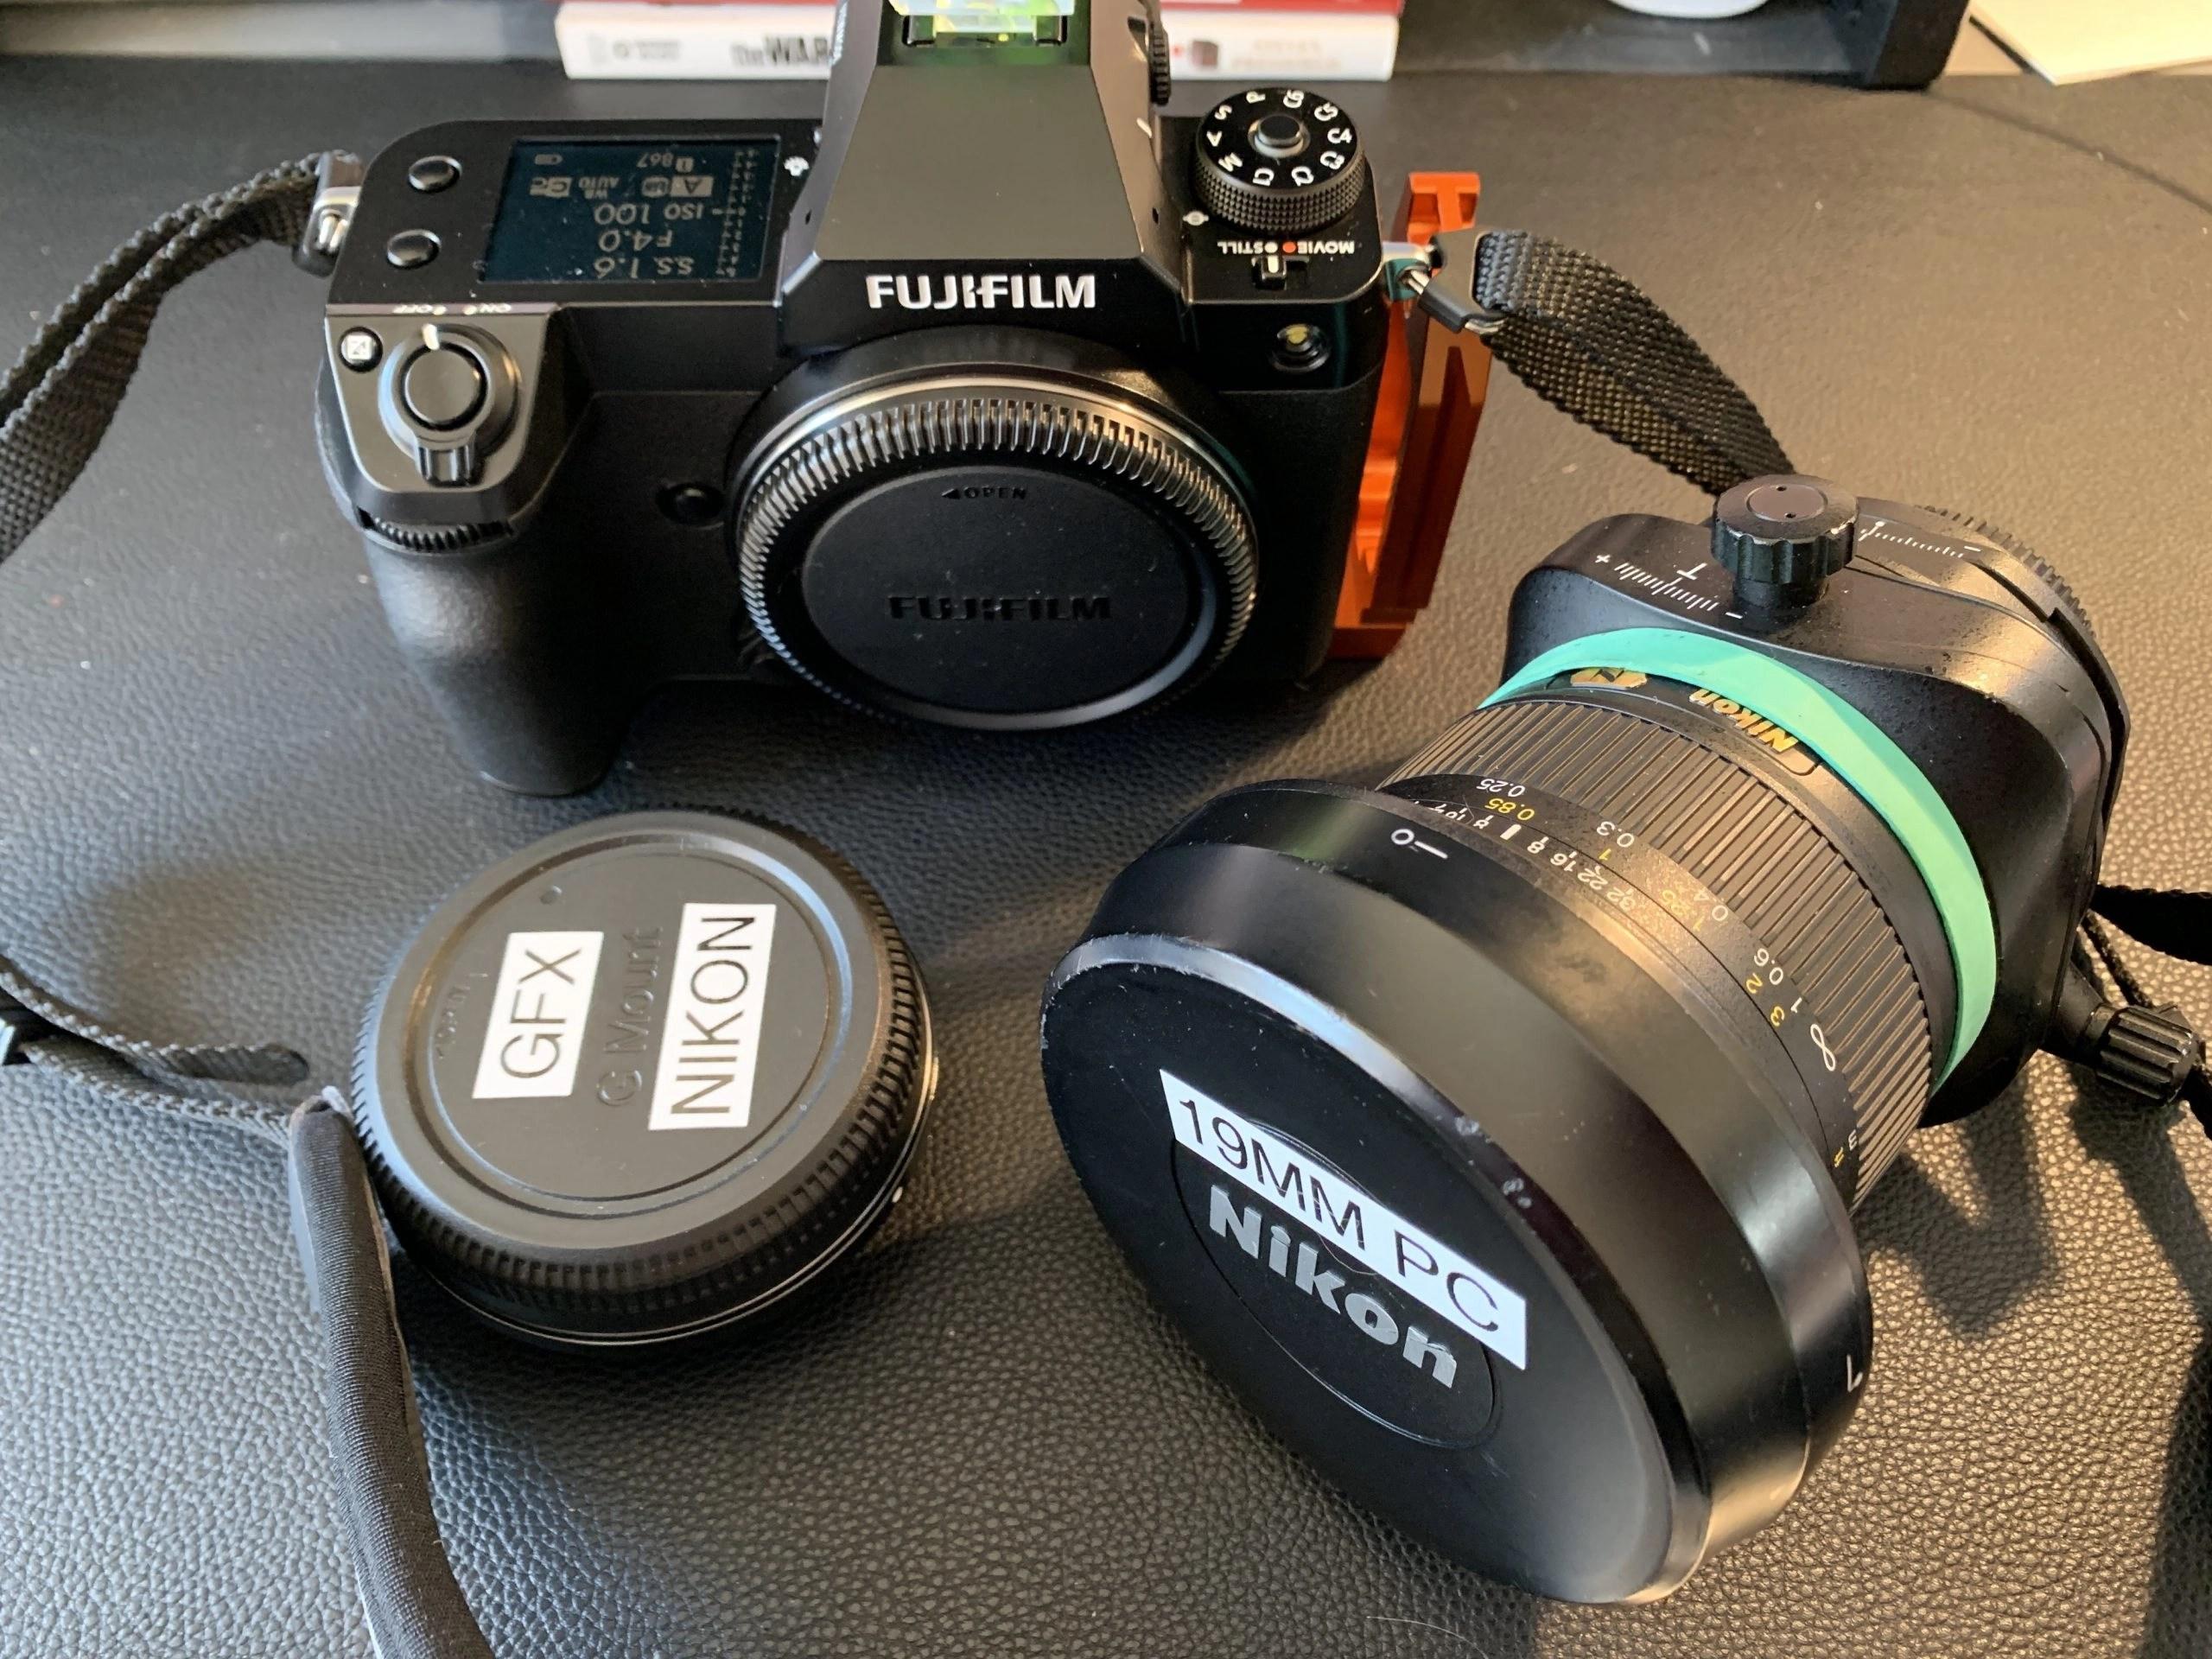 The Fujifilm GFX wishlist